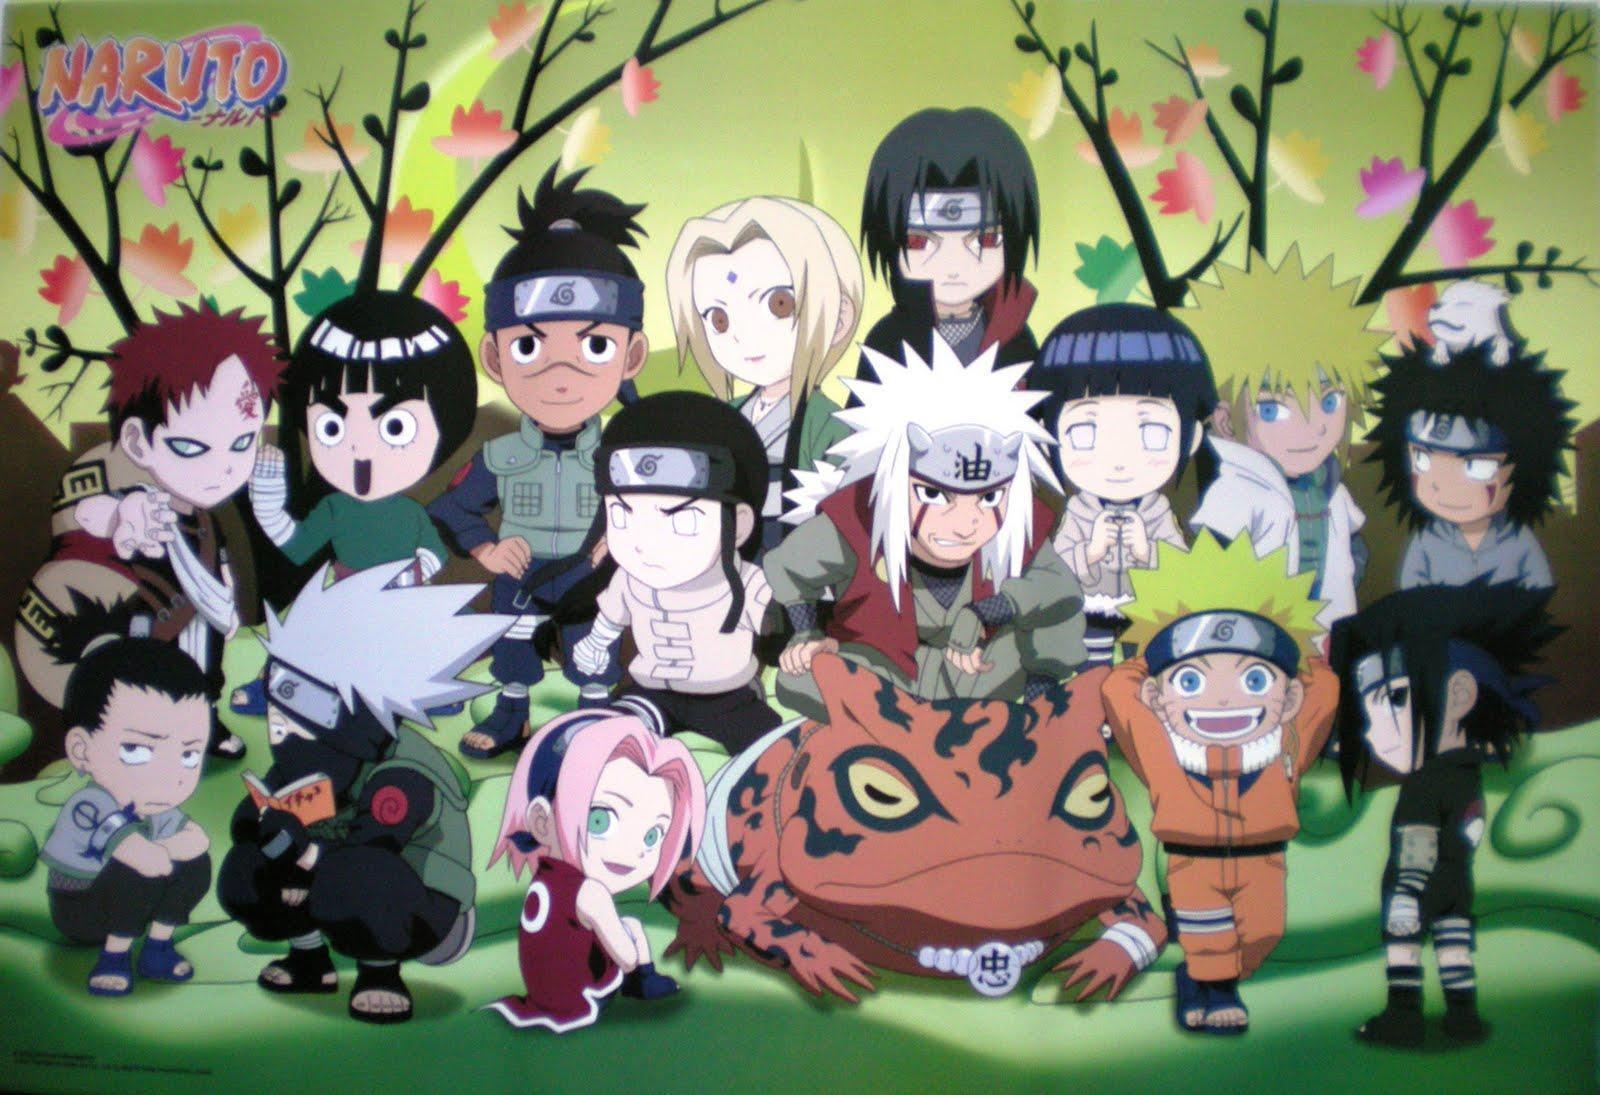 Wallpapers For > Naruto Chibi Wallpaper